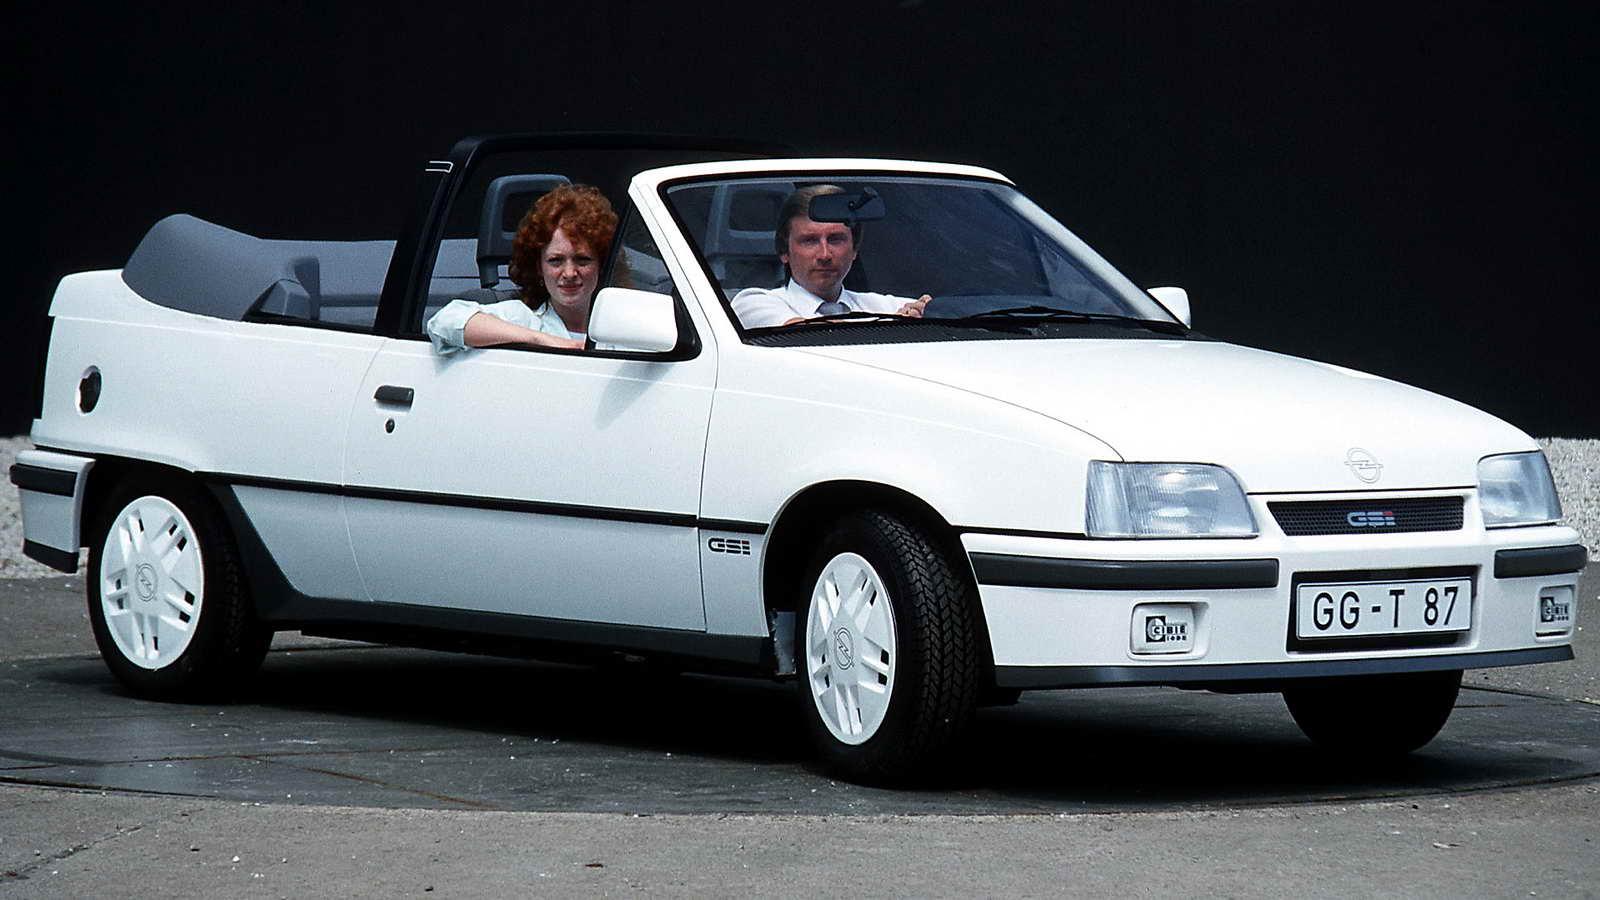 Bertone un siglo dise ando autom viles 2 2 for Opel kadett e interieur